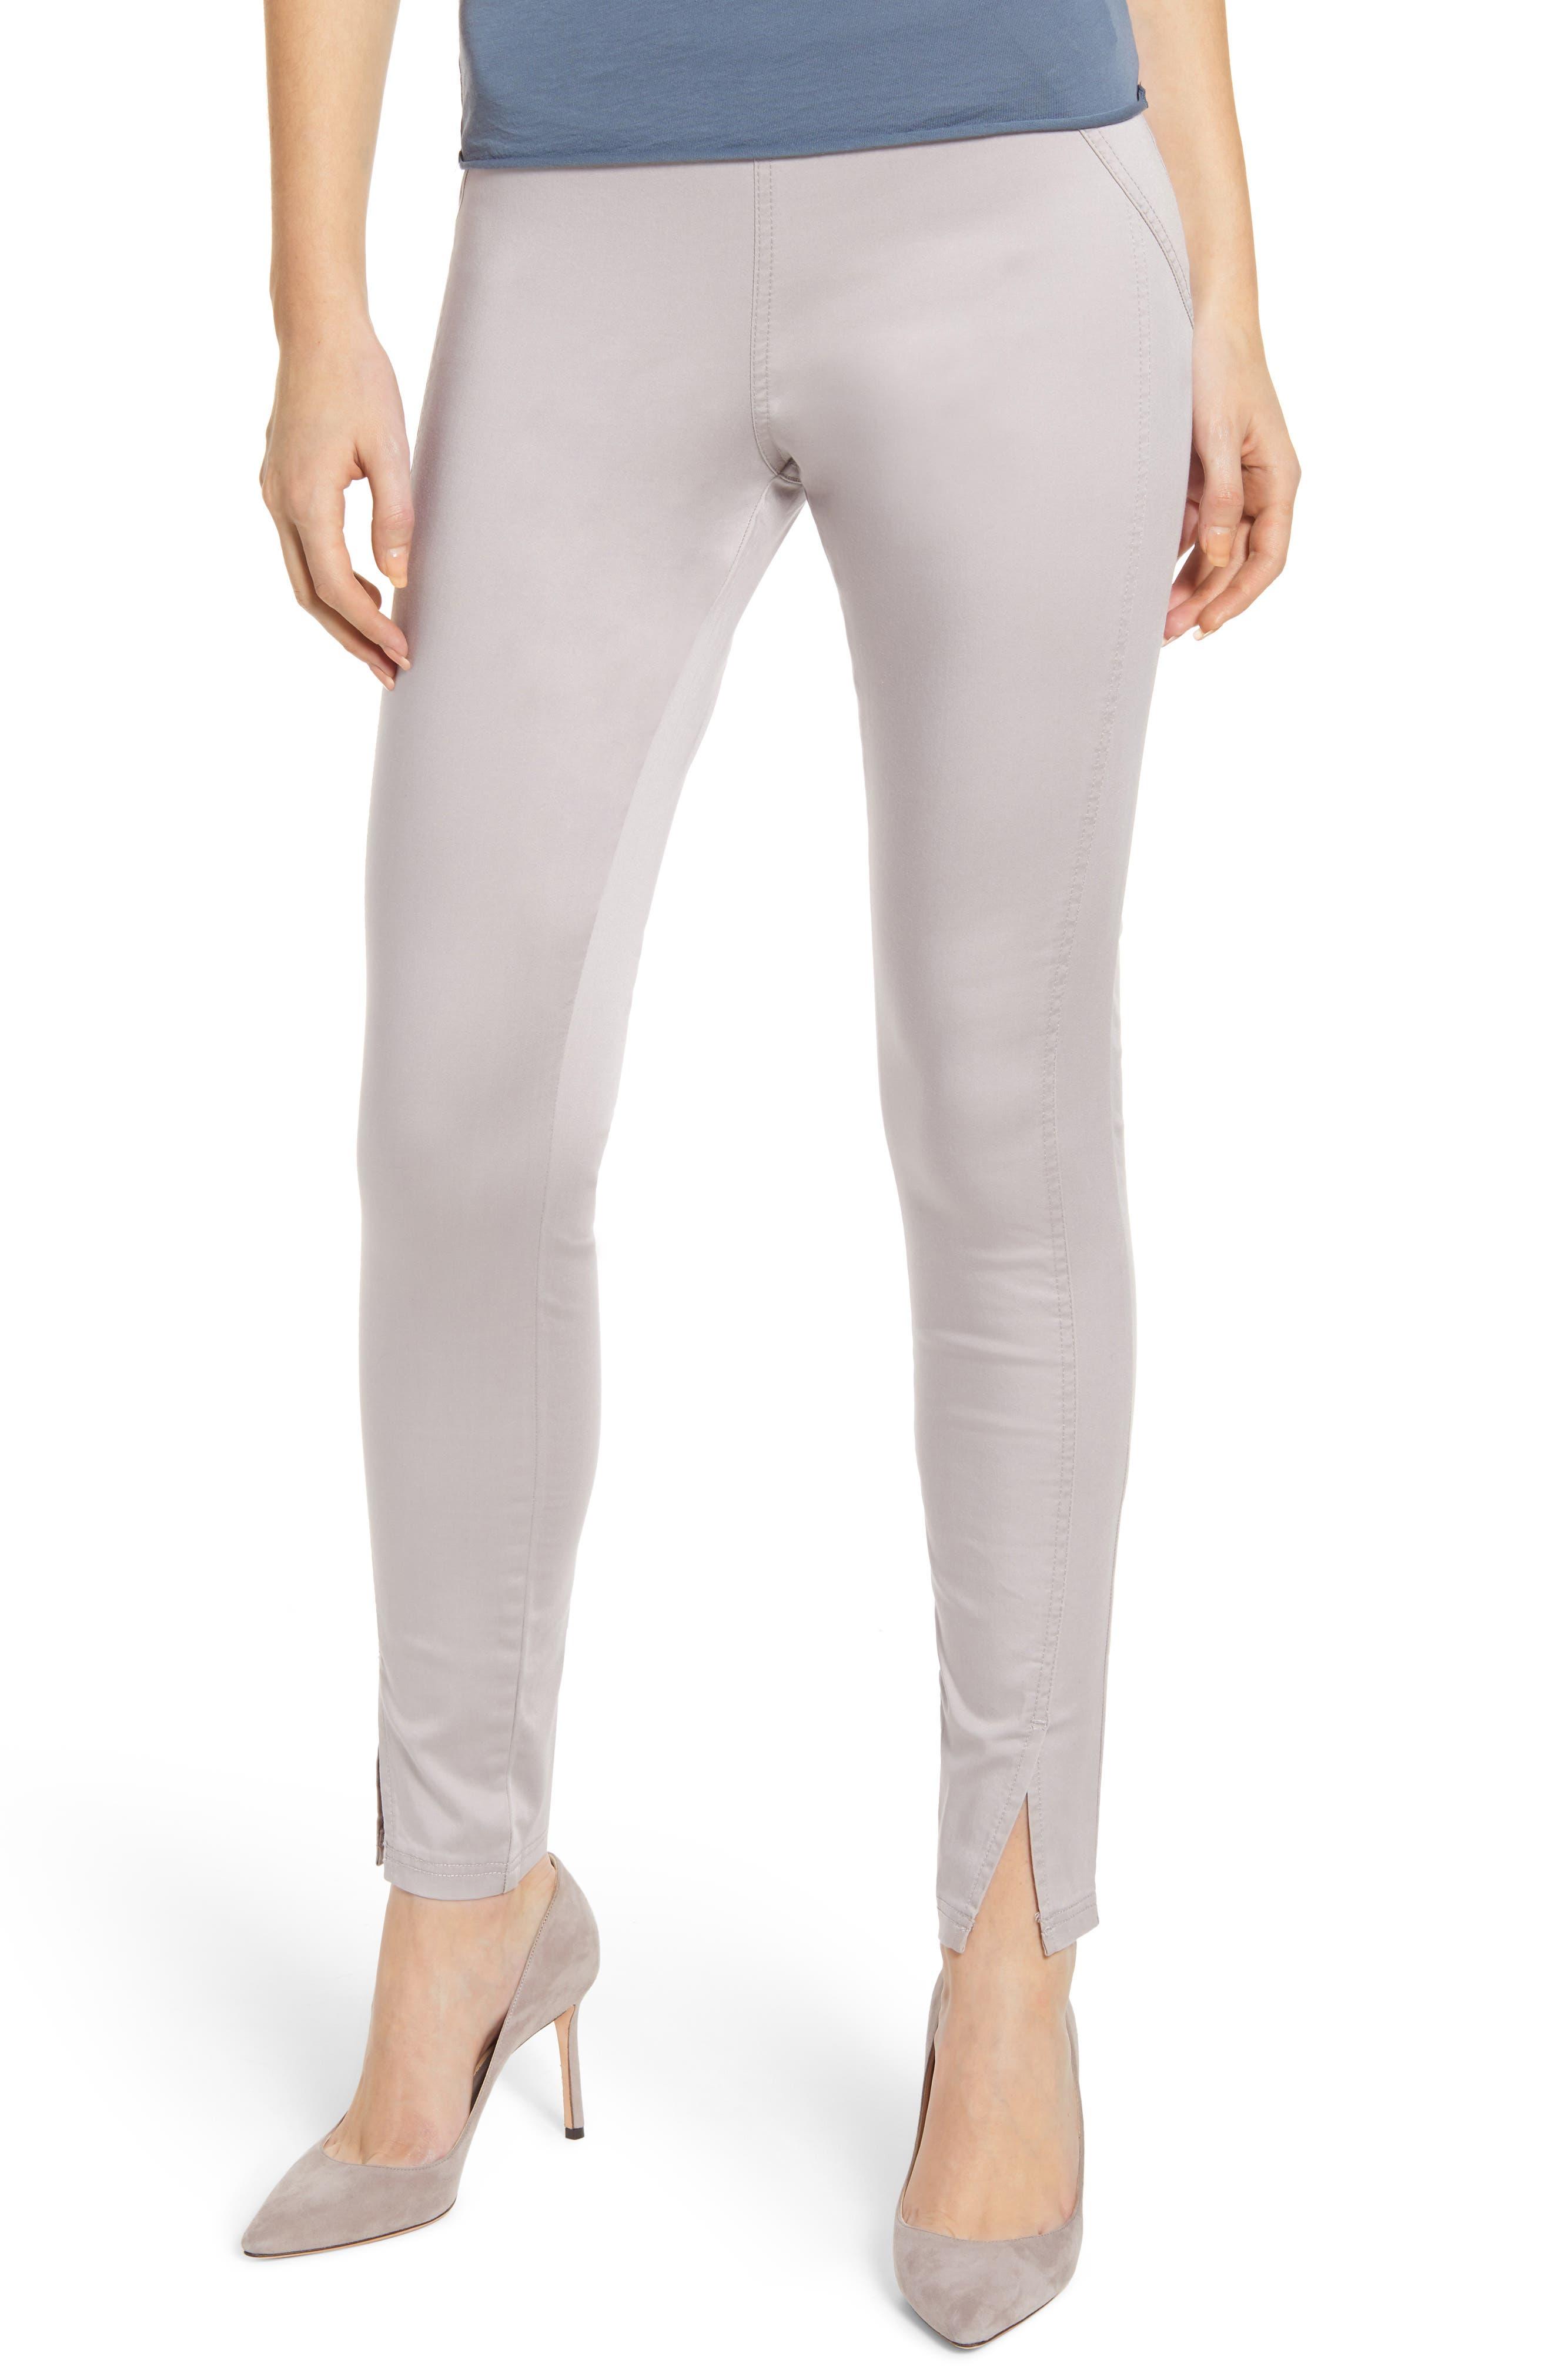 Hue High Waist Sateen Skimmer Leggings, Grey